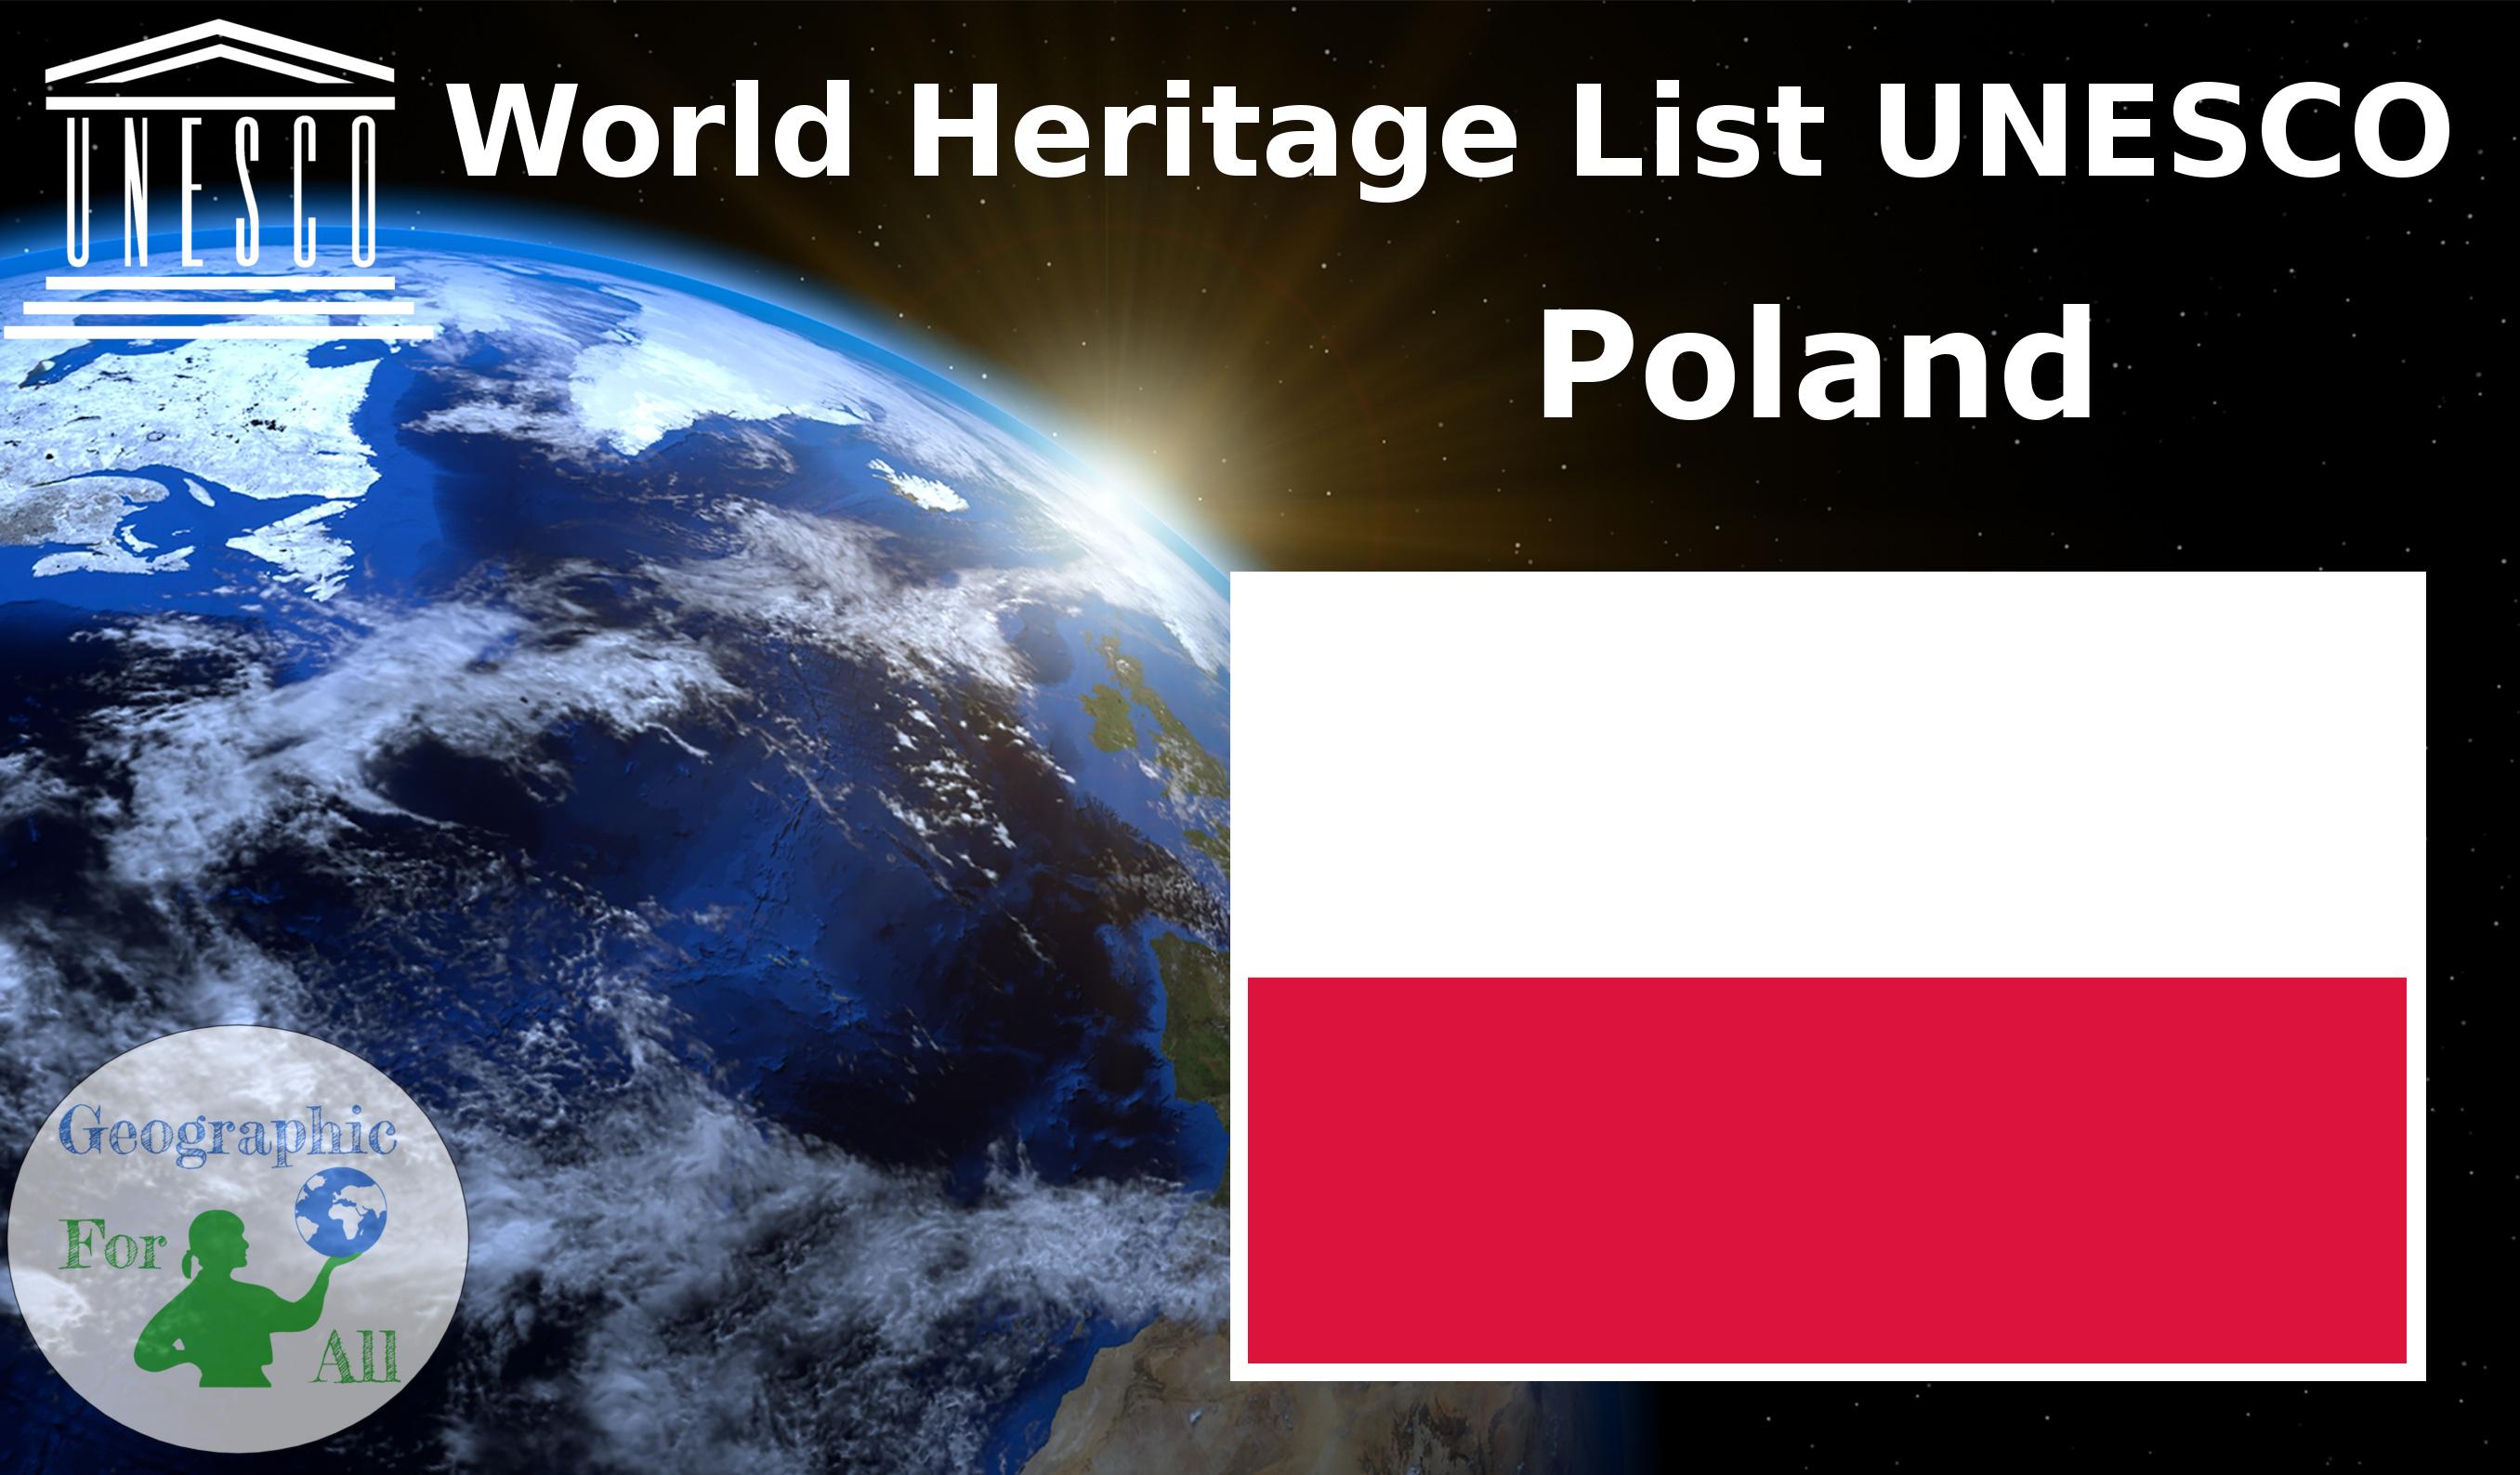 World Heritage List UNESCO - Poland